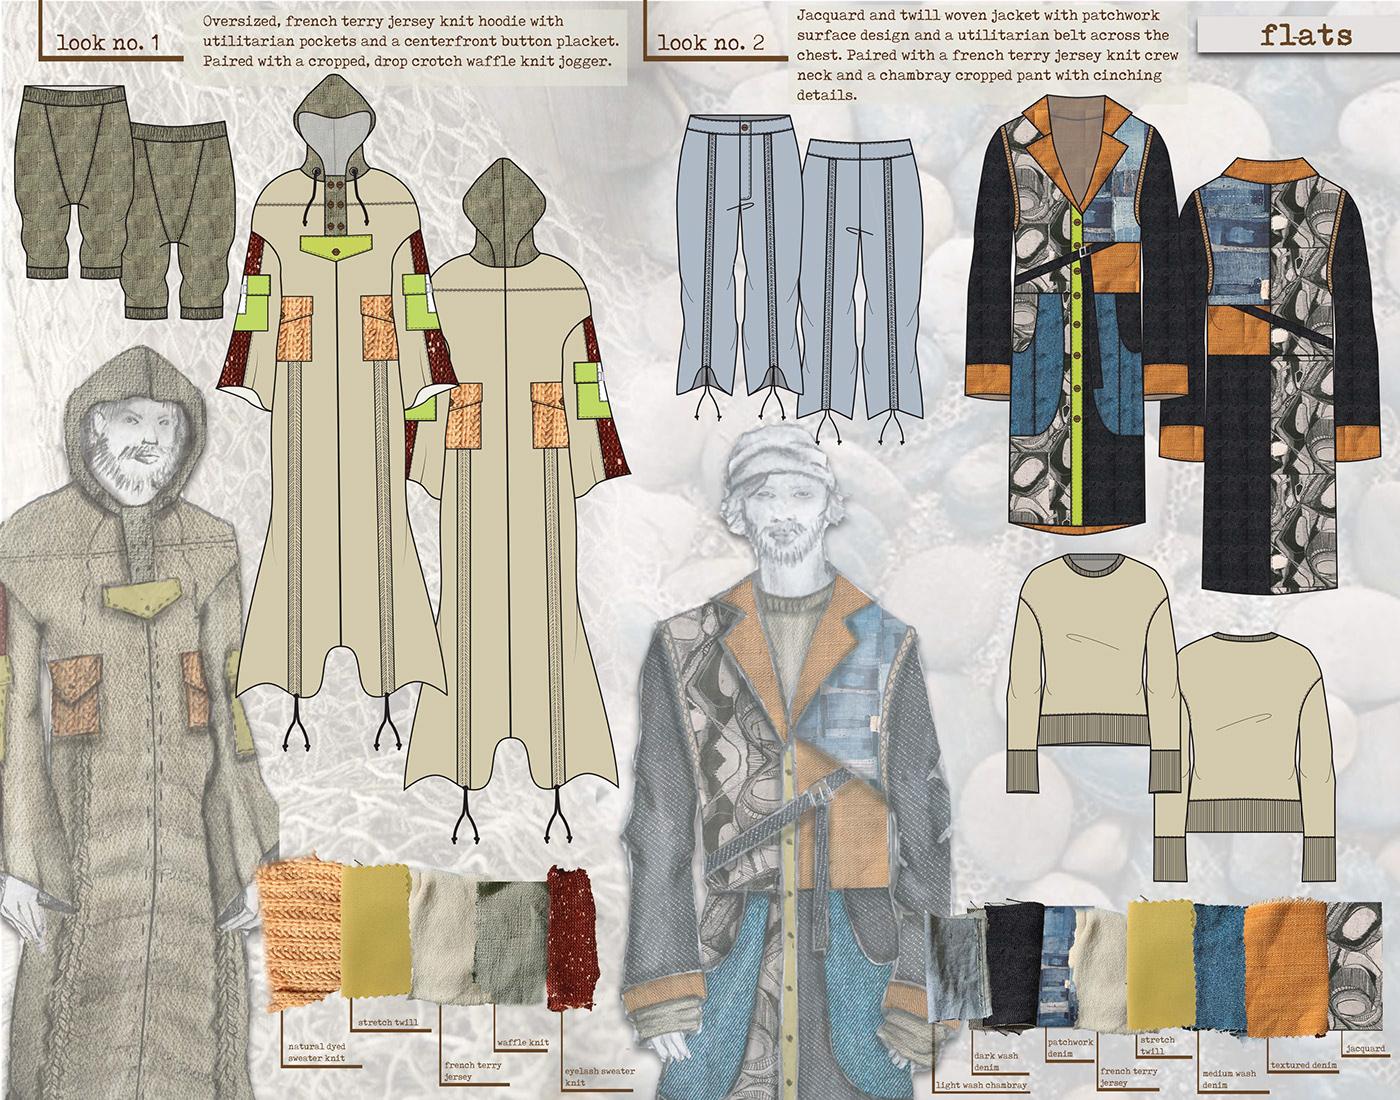 Childrenswear color story concept development Fabric Board fashion design fashion illustration hand rendering Menswear technical flats